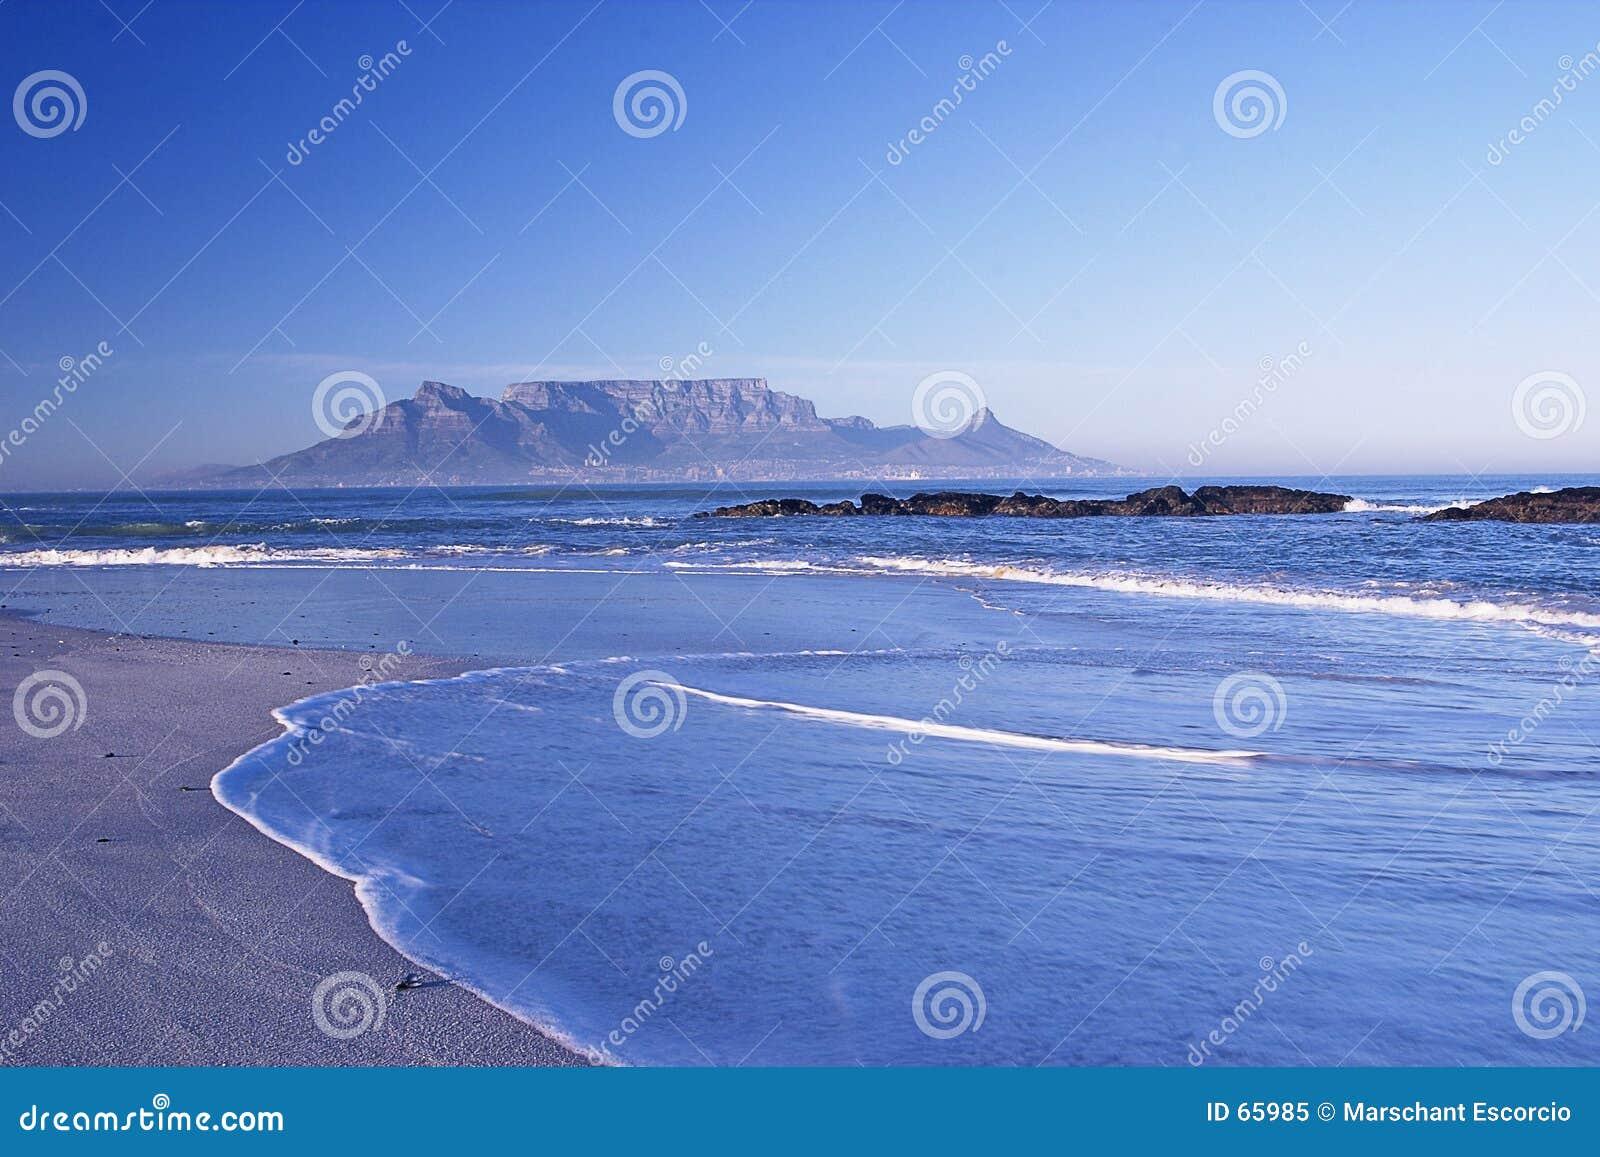 Distant Mountain across the sea